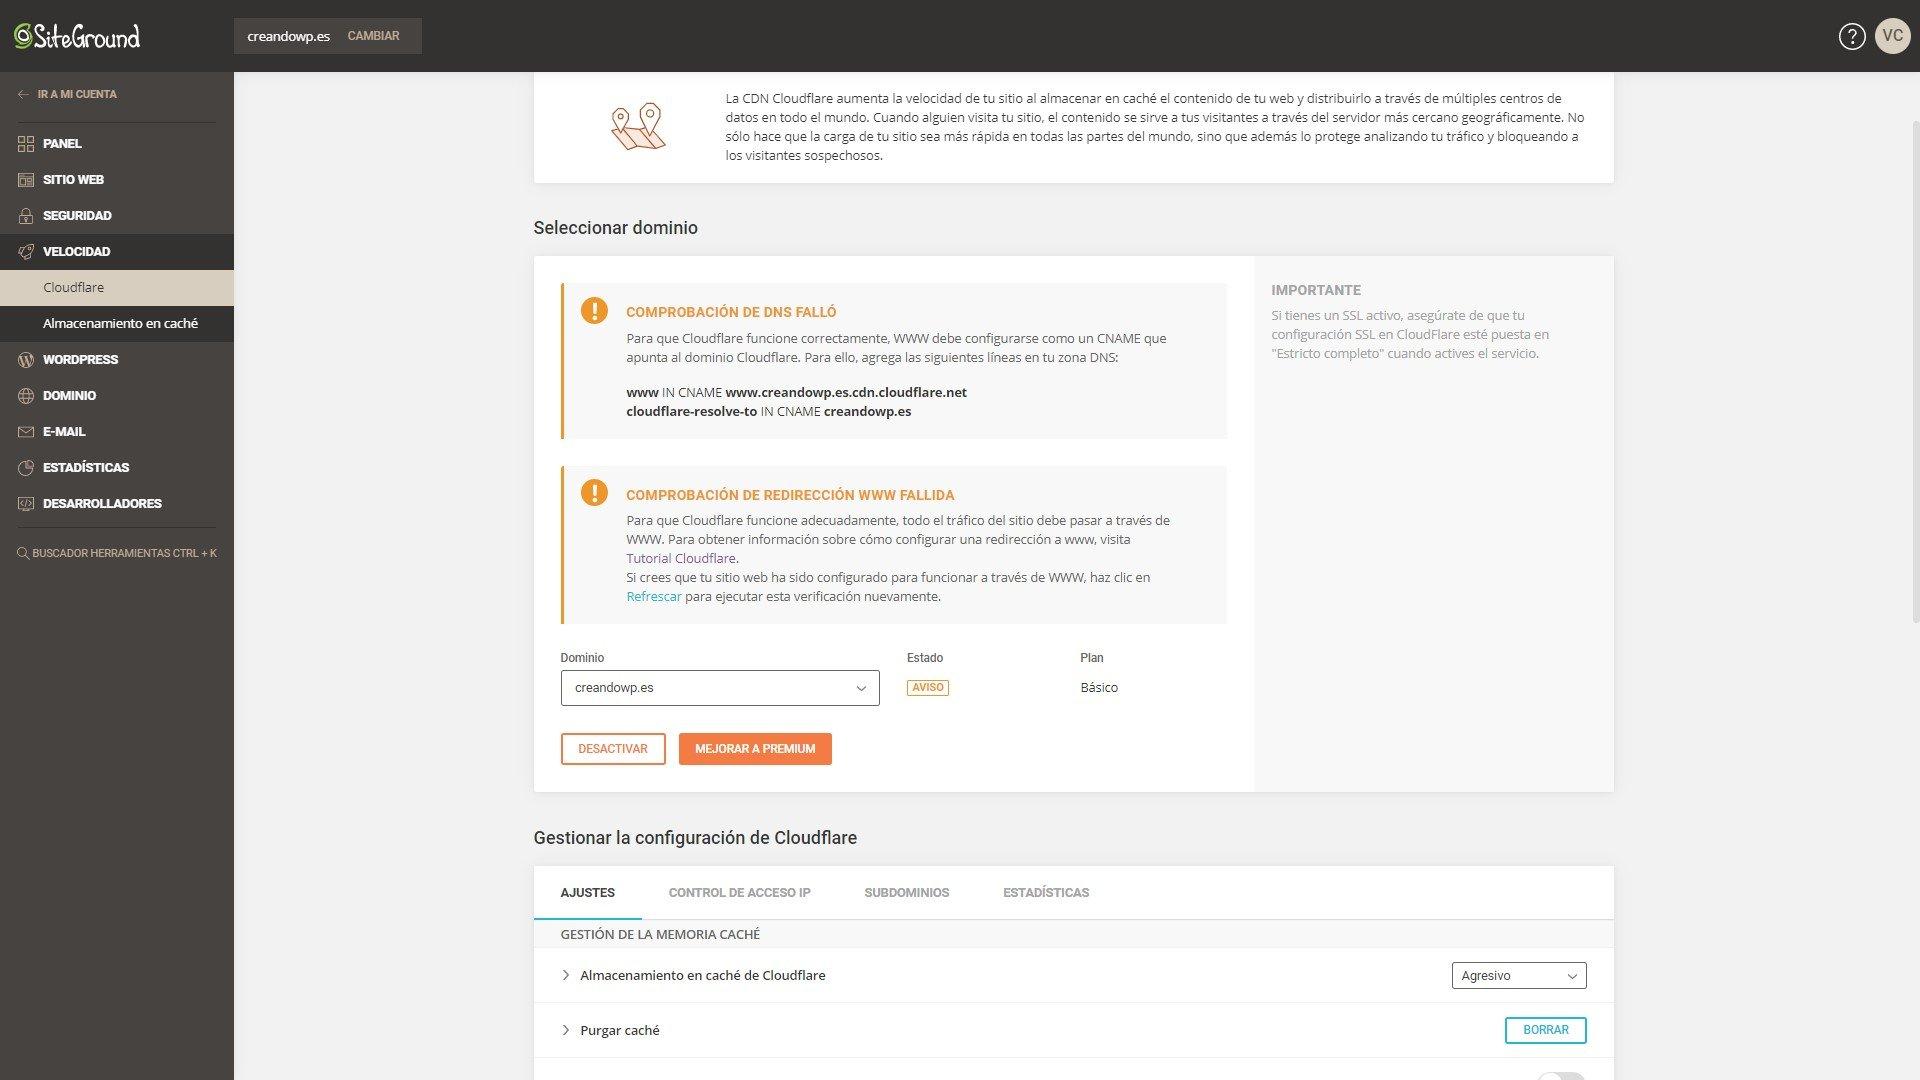 Panel de control de Cloudfare en Siteground